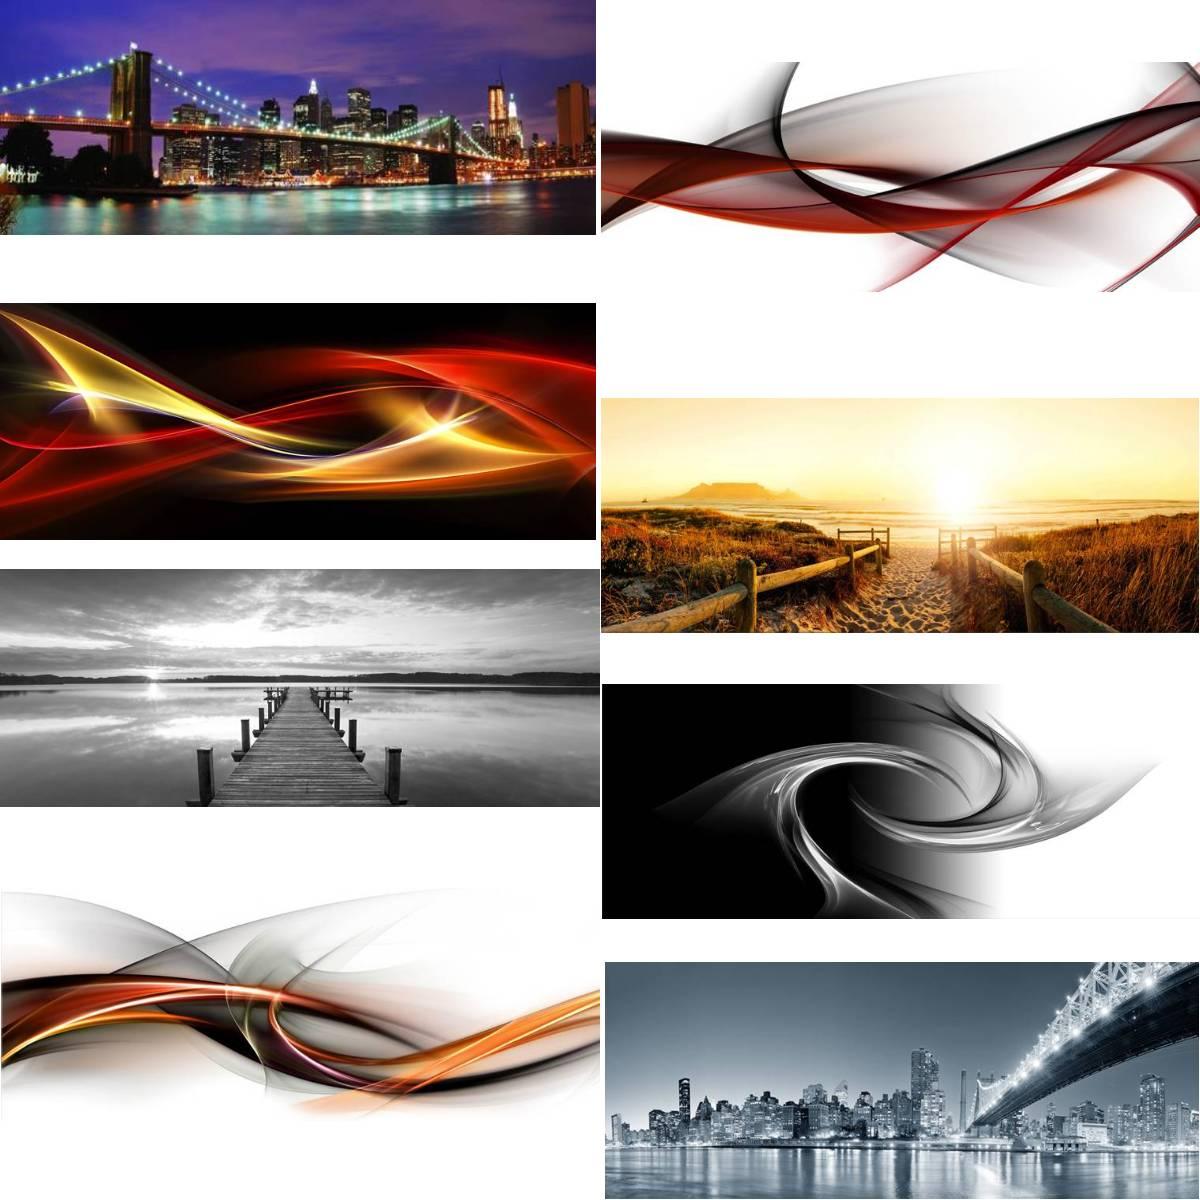 bild glasbild 125x50 bilder glasbilder druck acryl wandbild wandbilder leinwand ebay. Black Bedroom Furniture Sets. Home Design Ideas